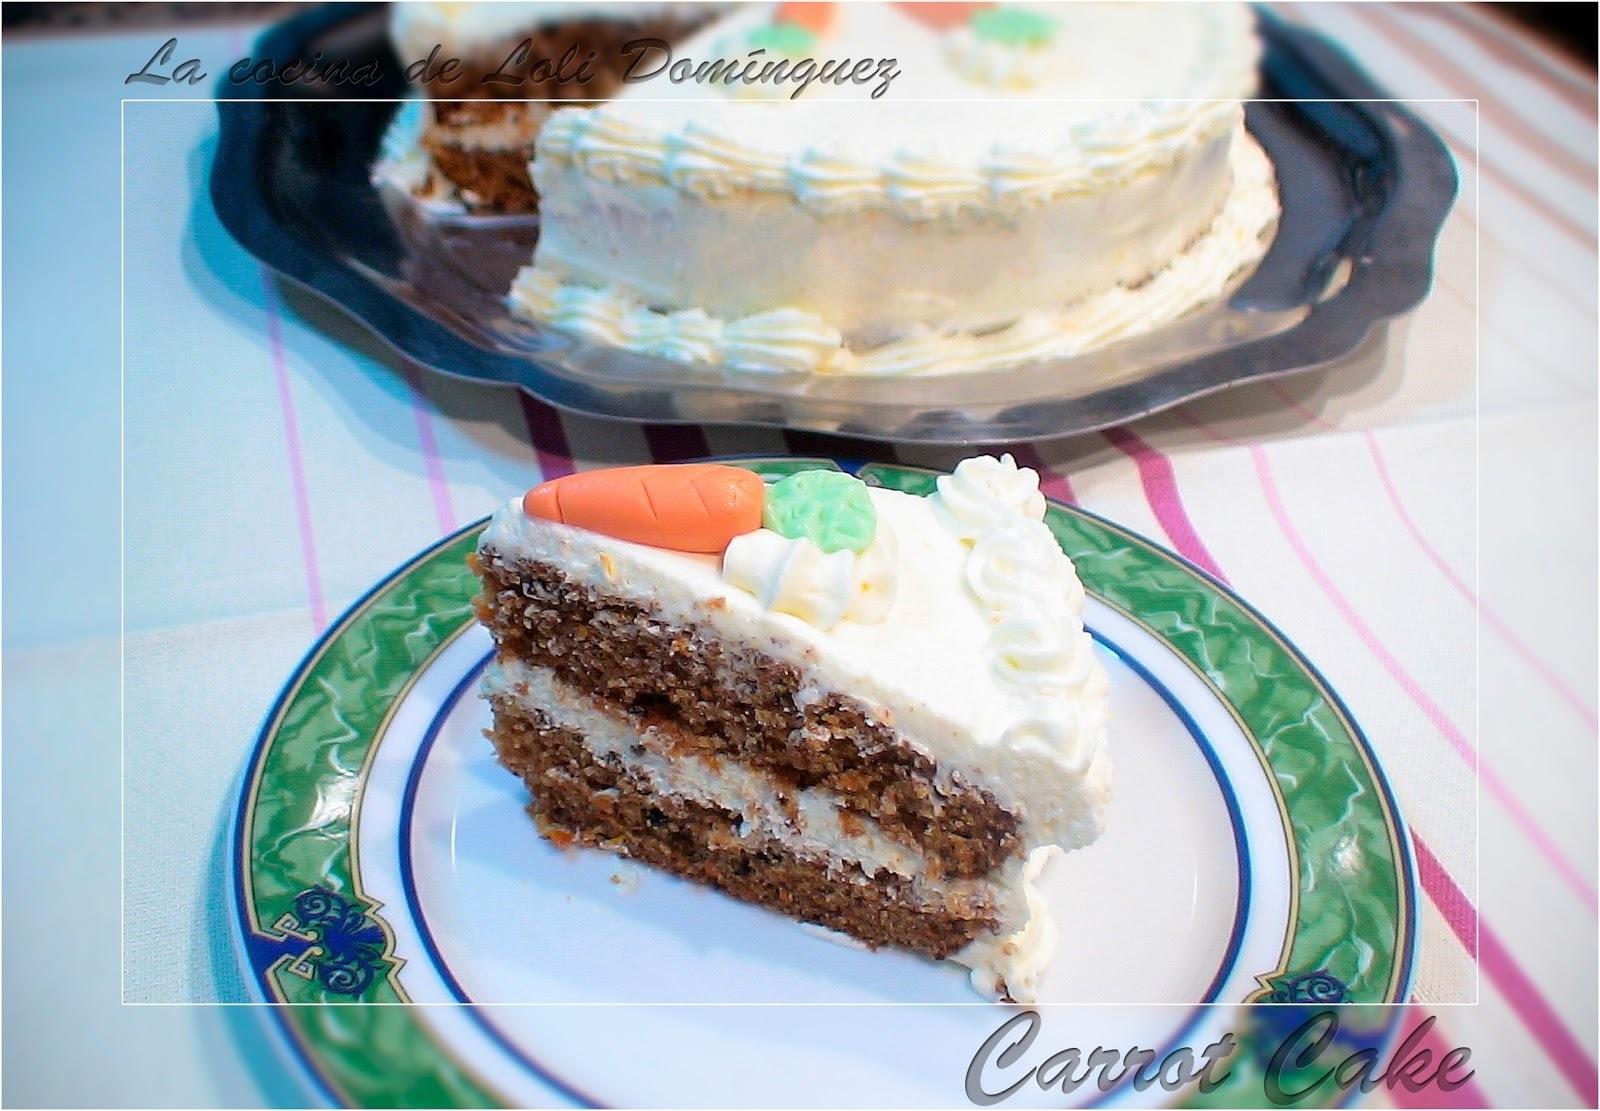 Carrot CakeTarta de zanahoria con crema de queso a la naranja